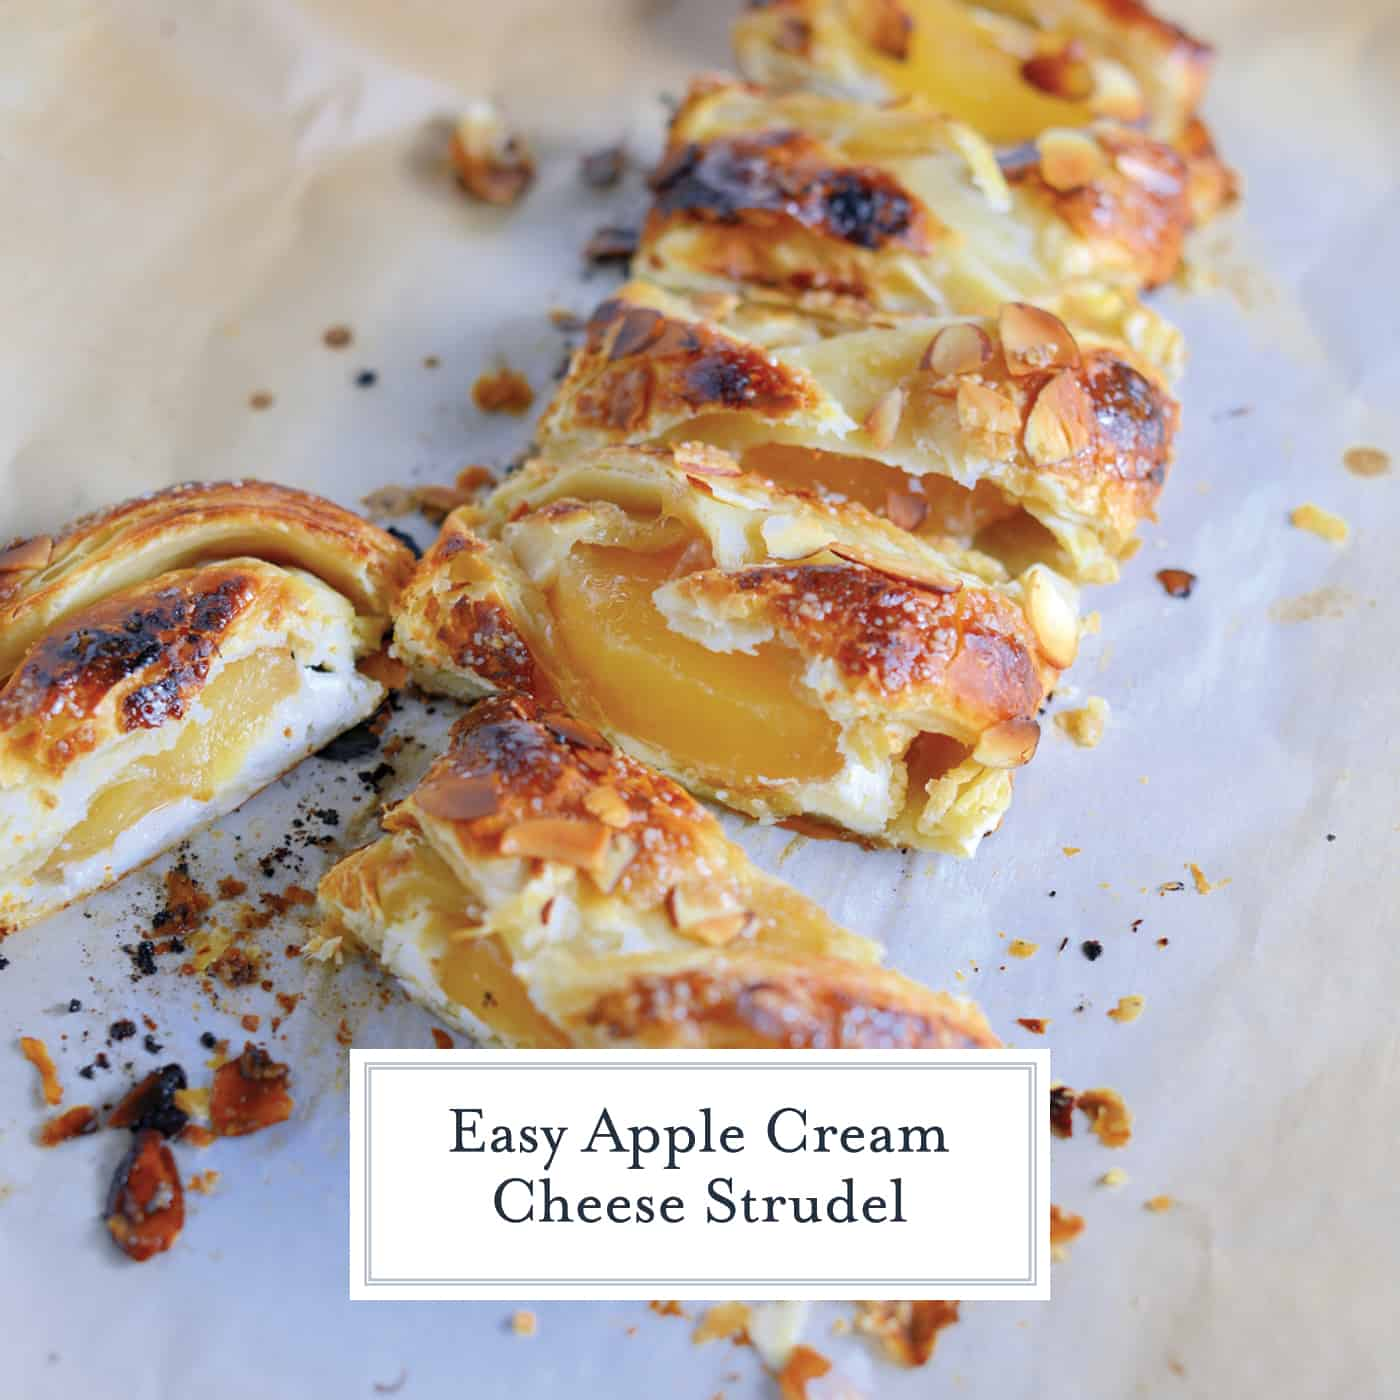 Easy Apple Cream Cheese Strudel